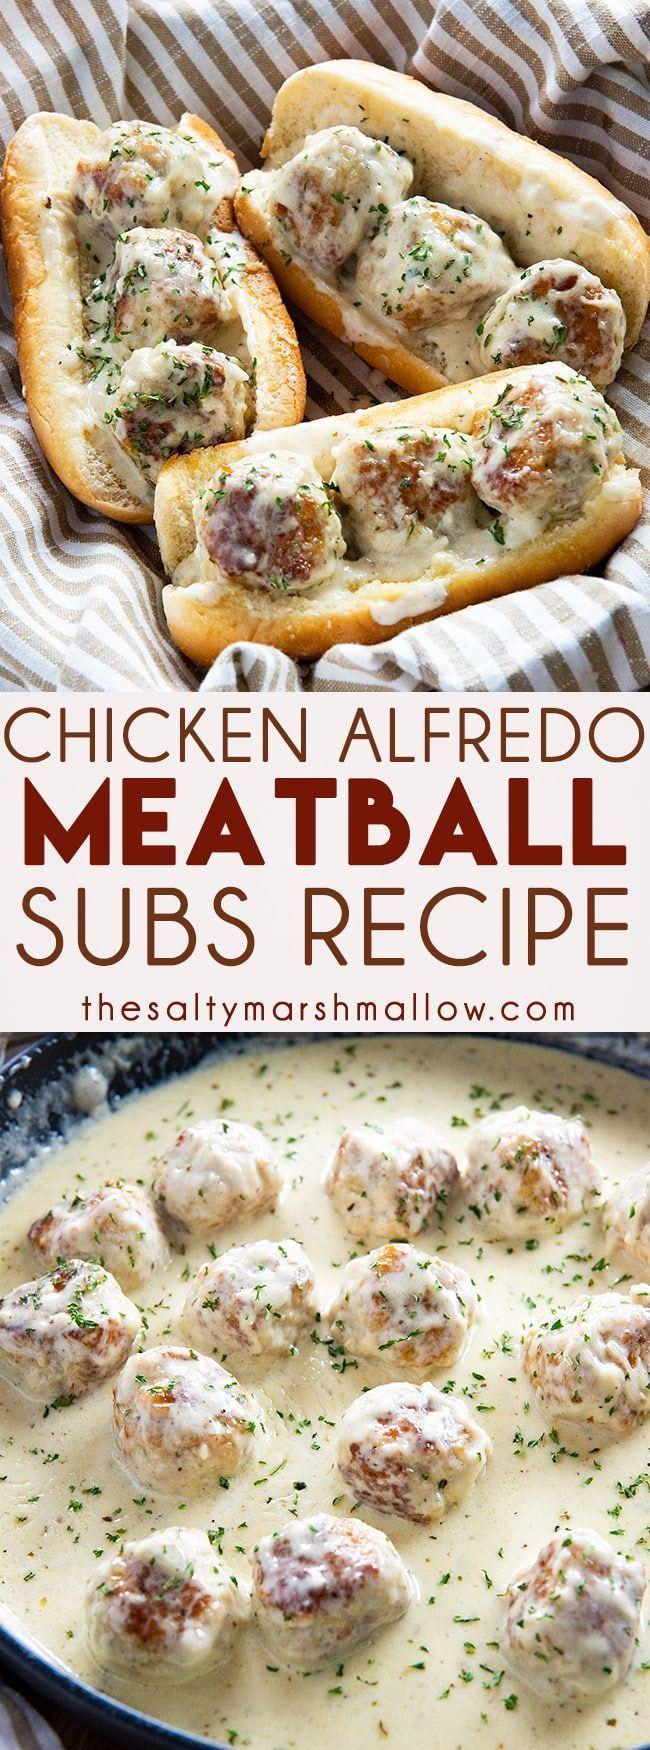 Photo of Chicken Alfredo Meatball Subs